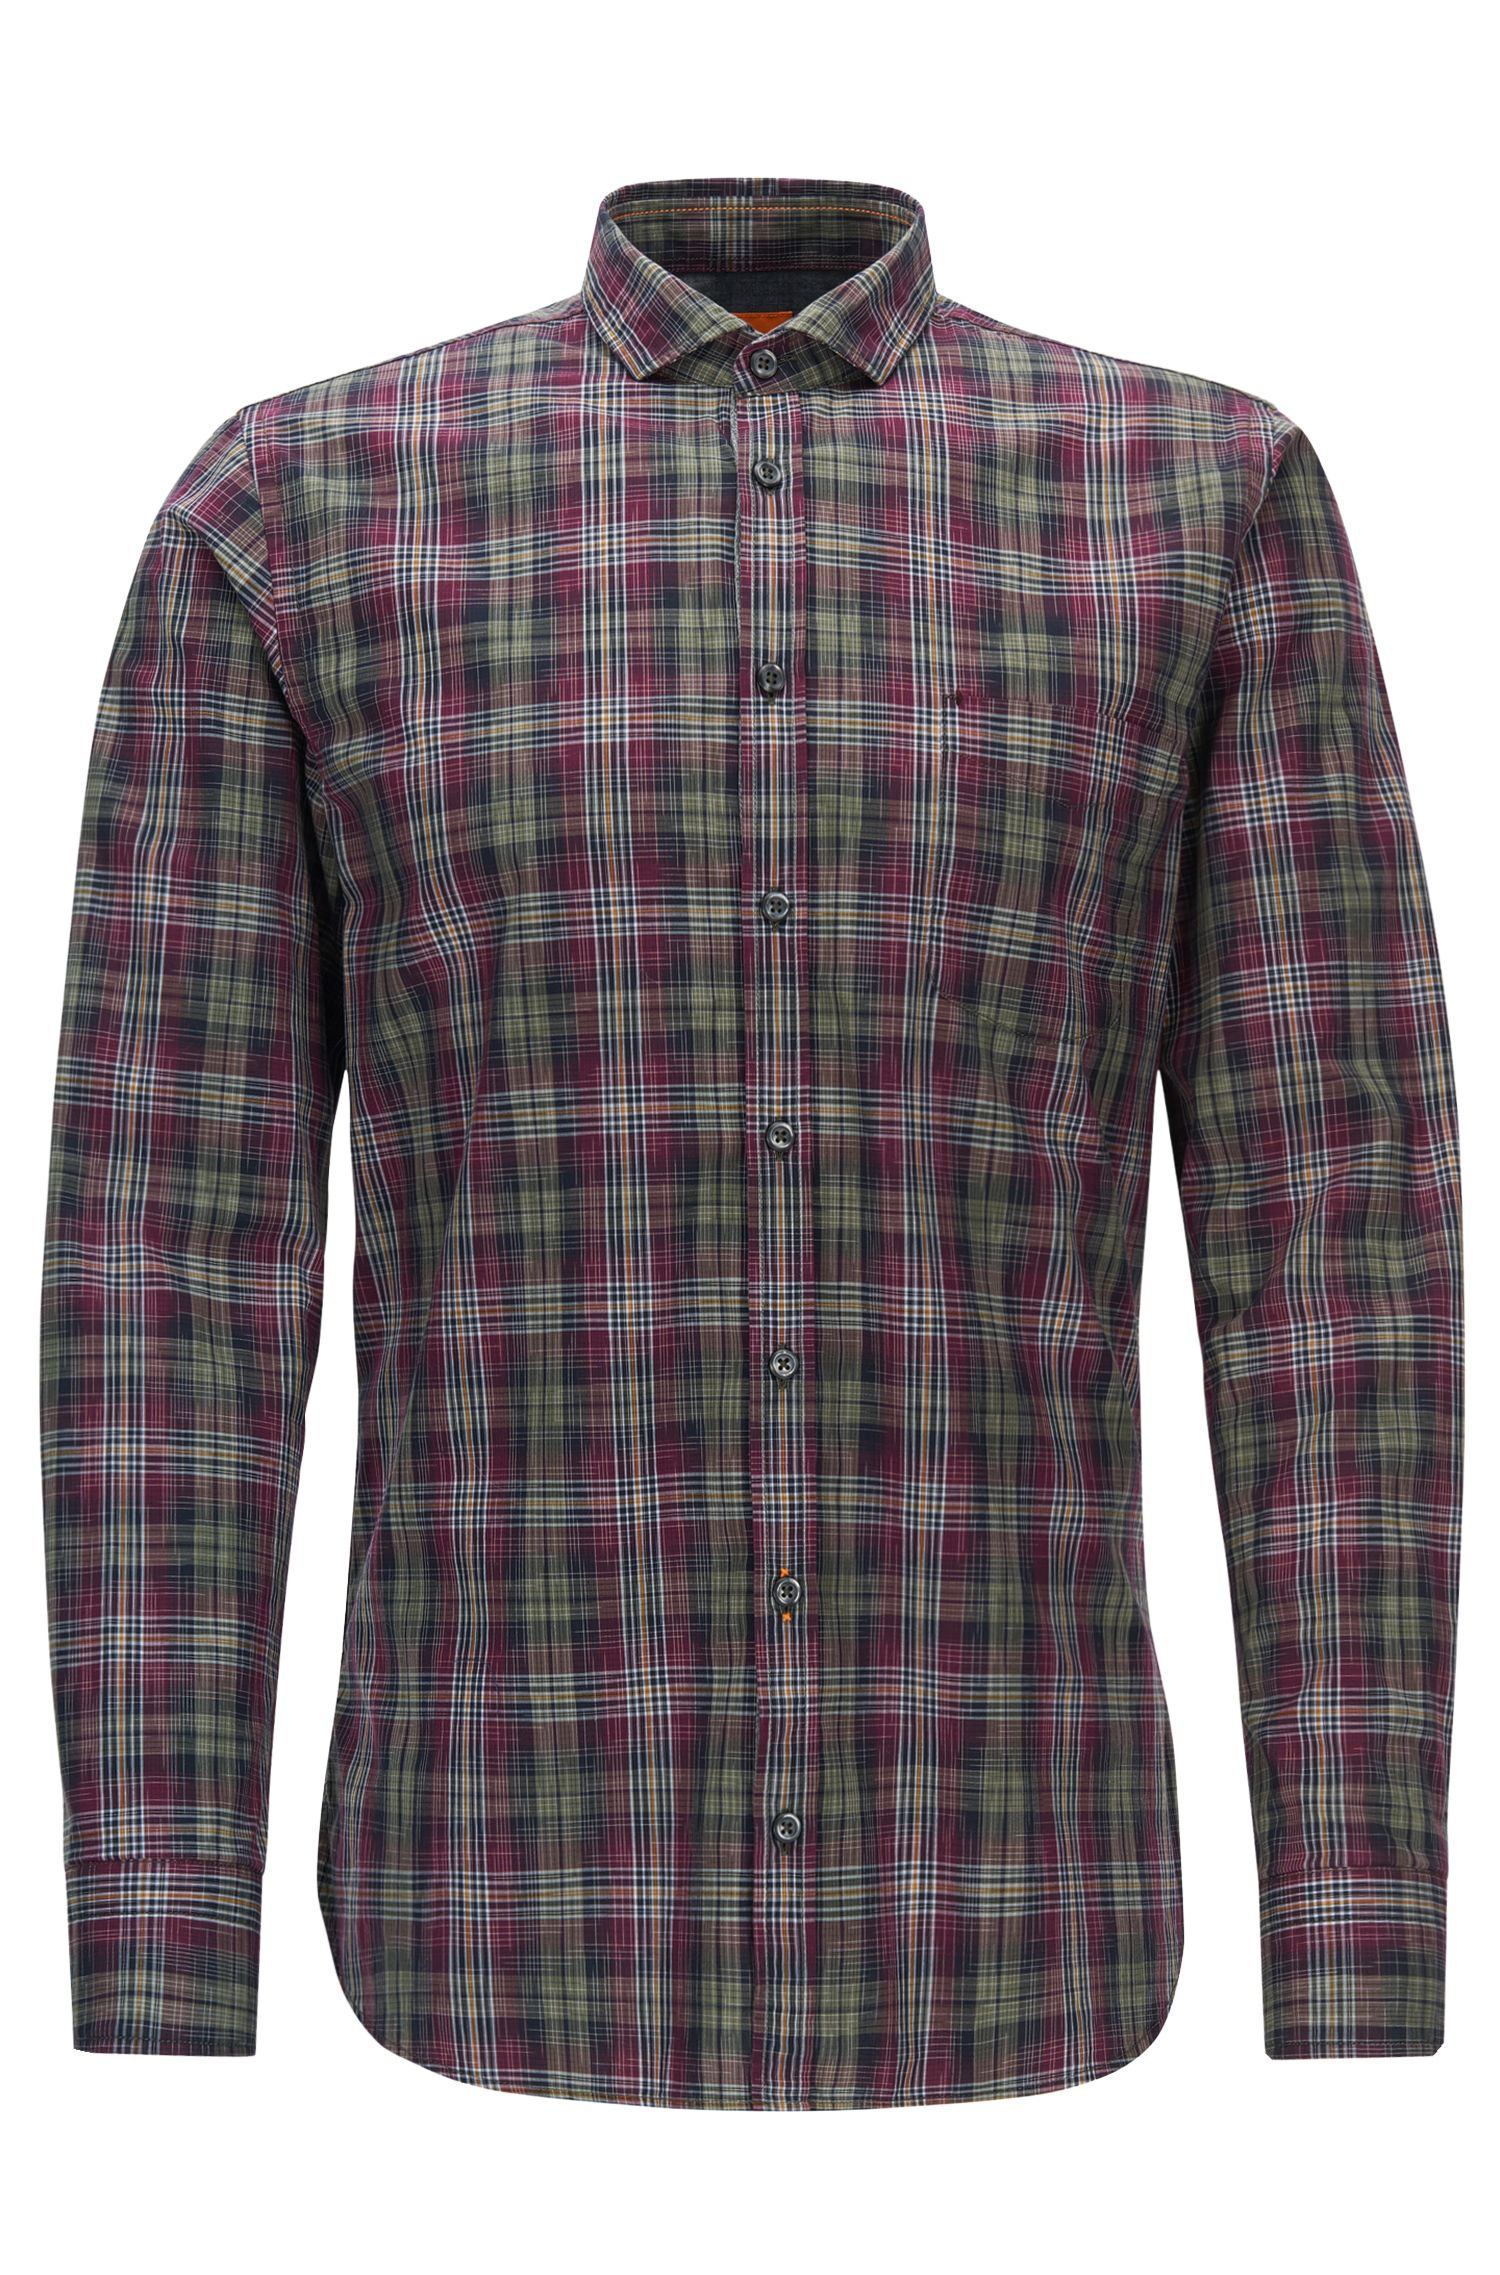 Slim-fit shirt in Glen plaid cotton